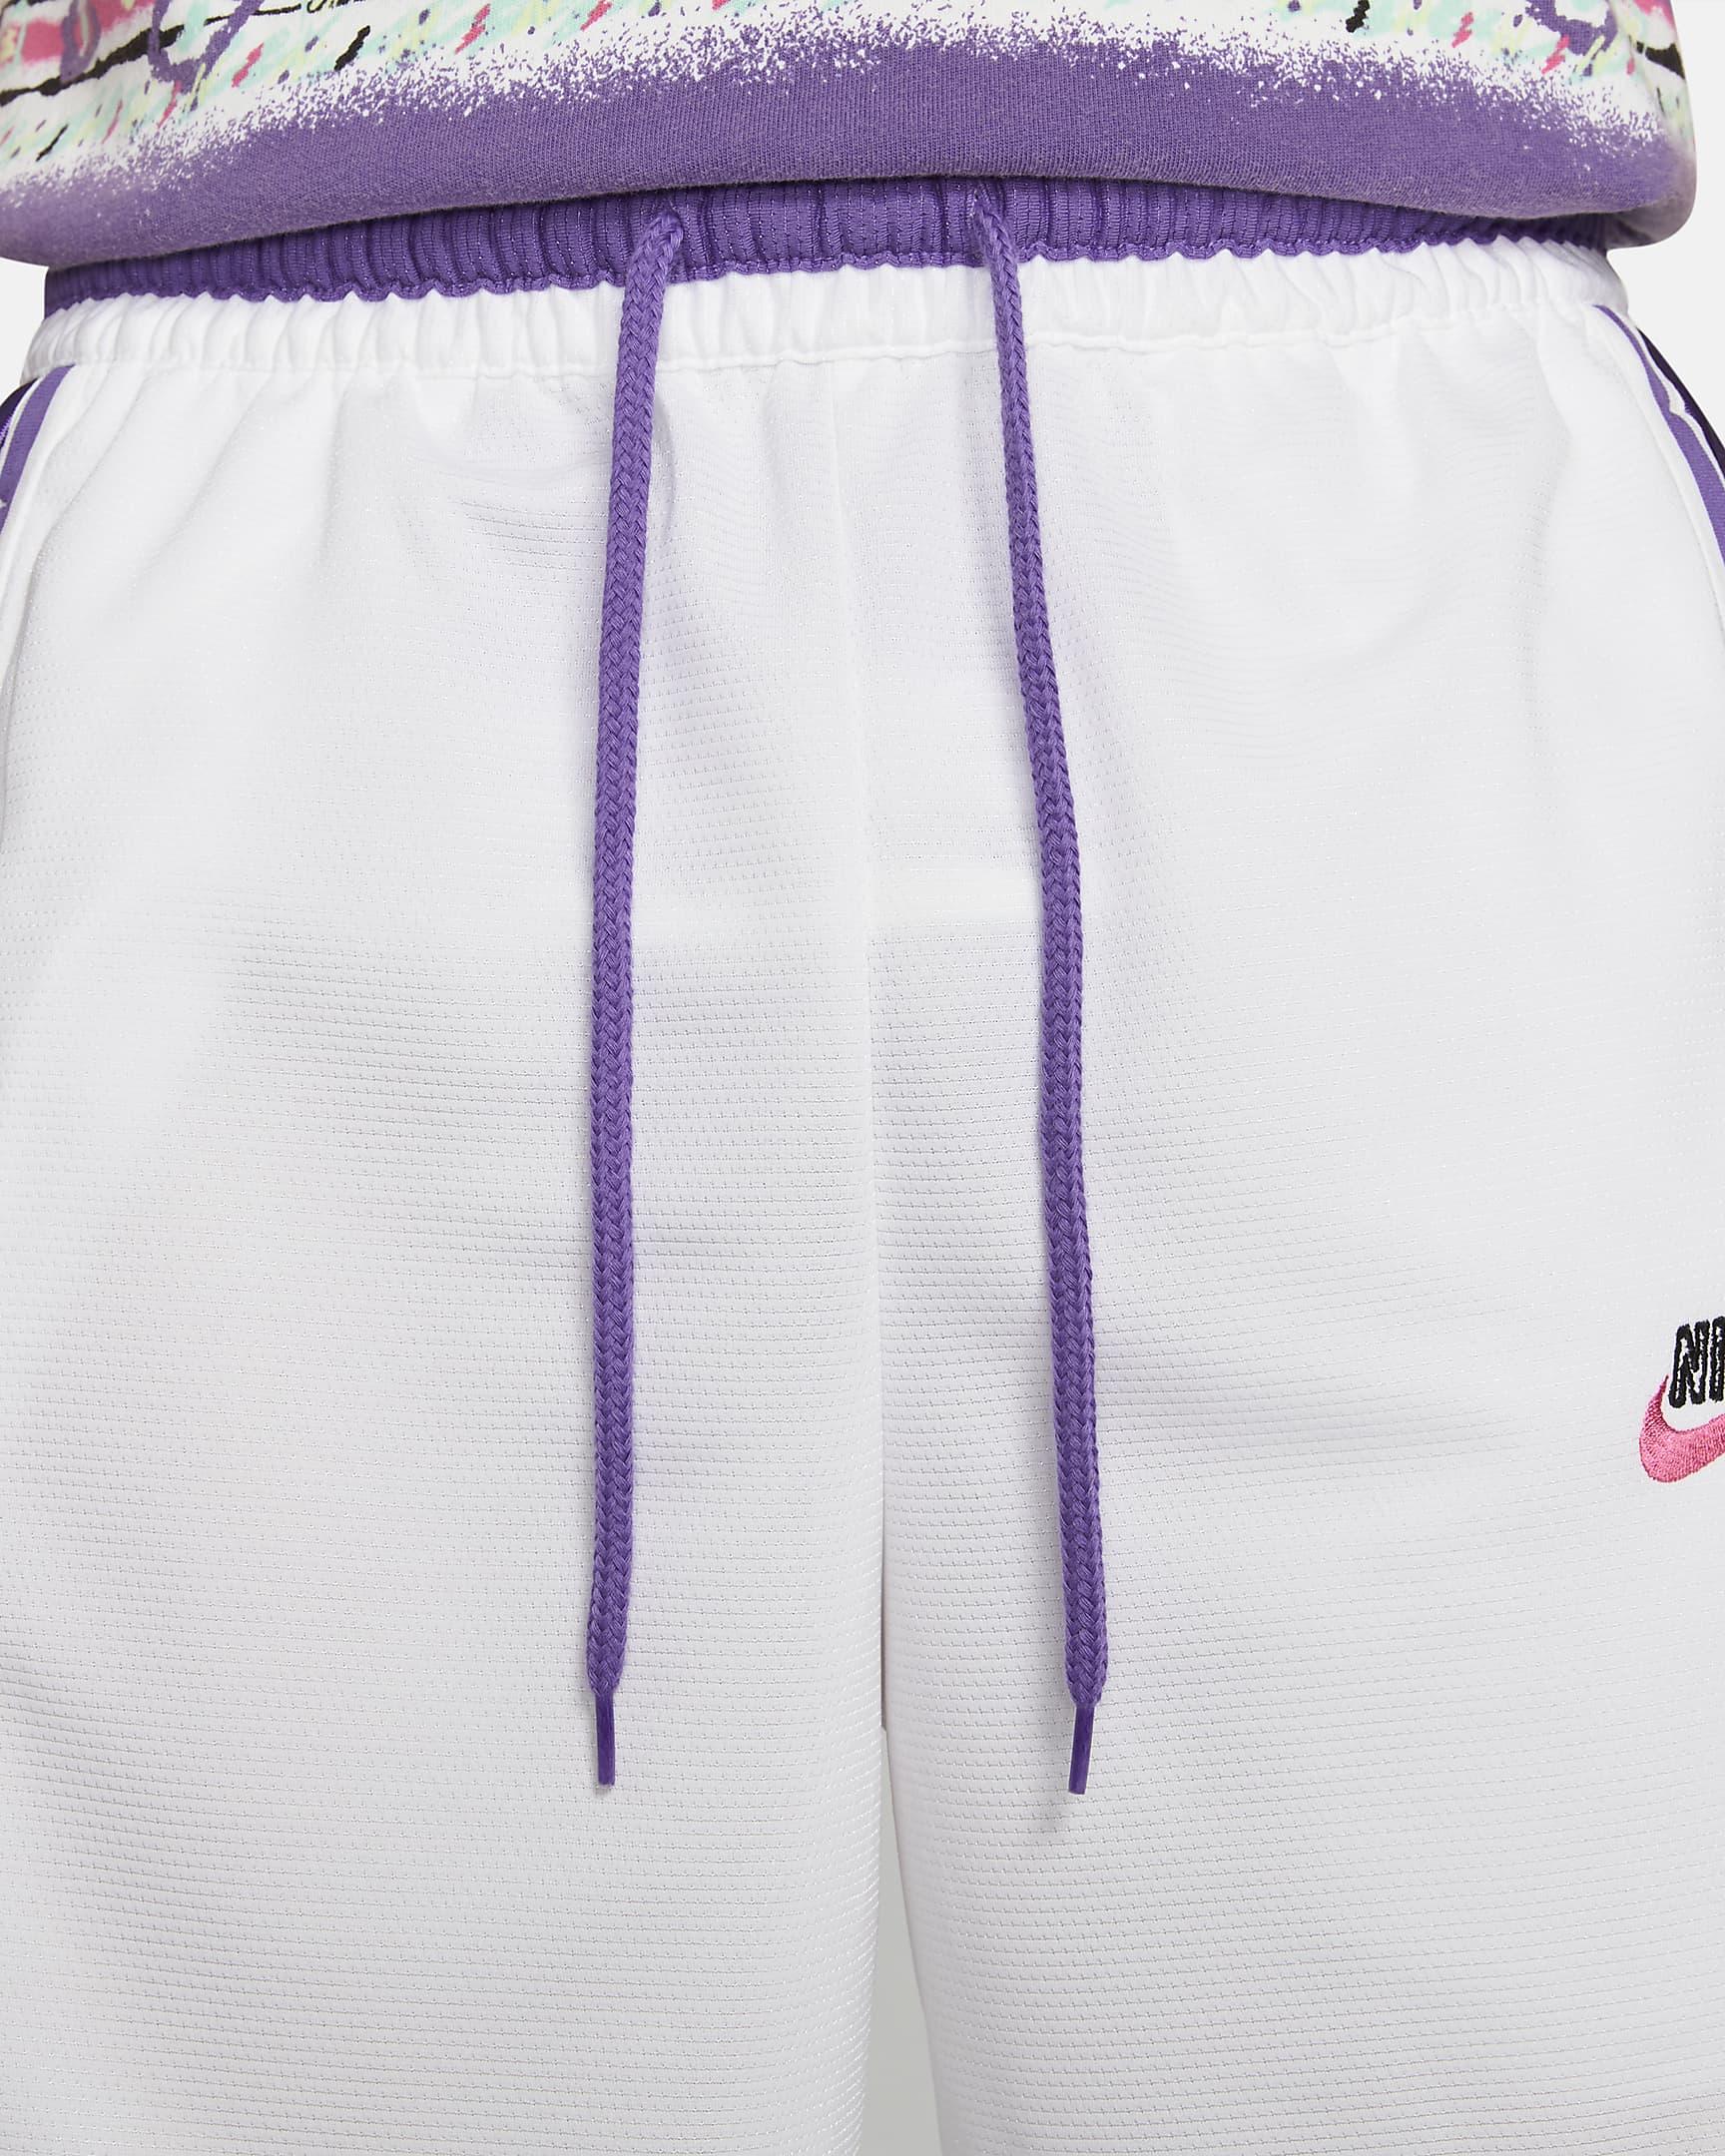 nike-dri-fit-dna-stories-mens-basketball-shorts-gLqWHW-9.png